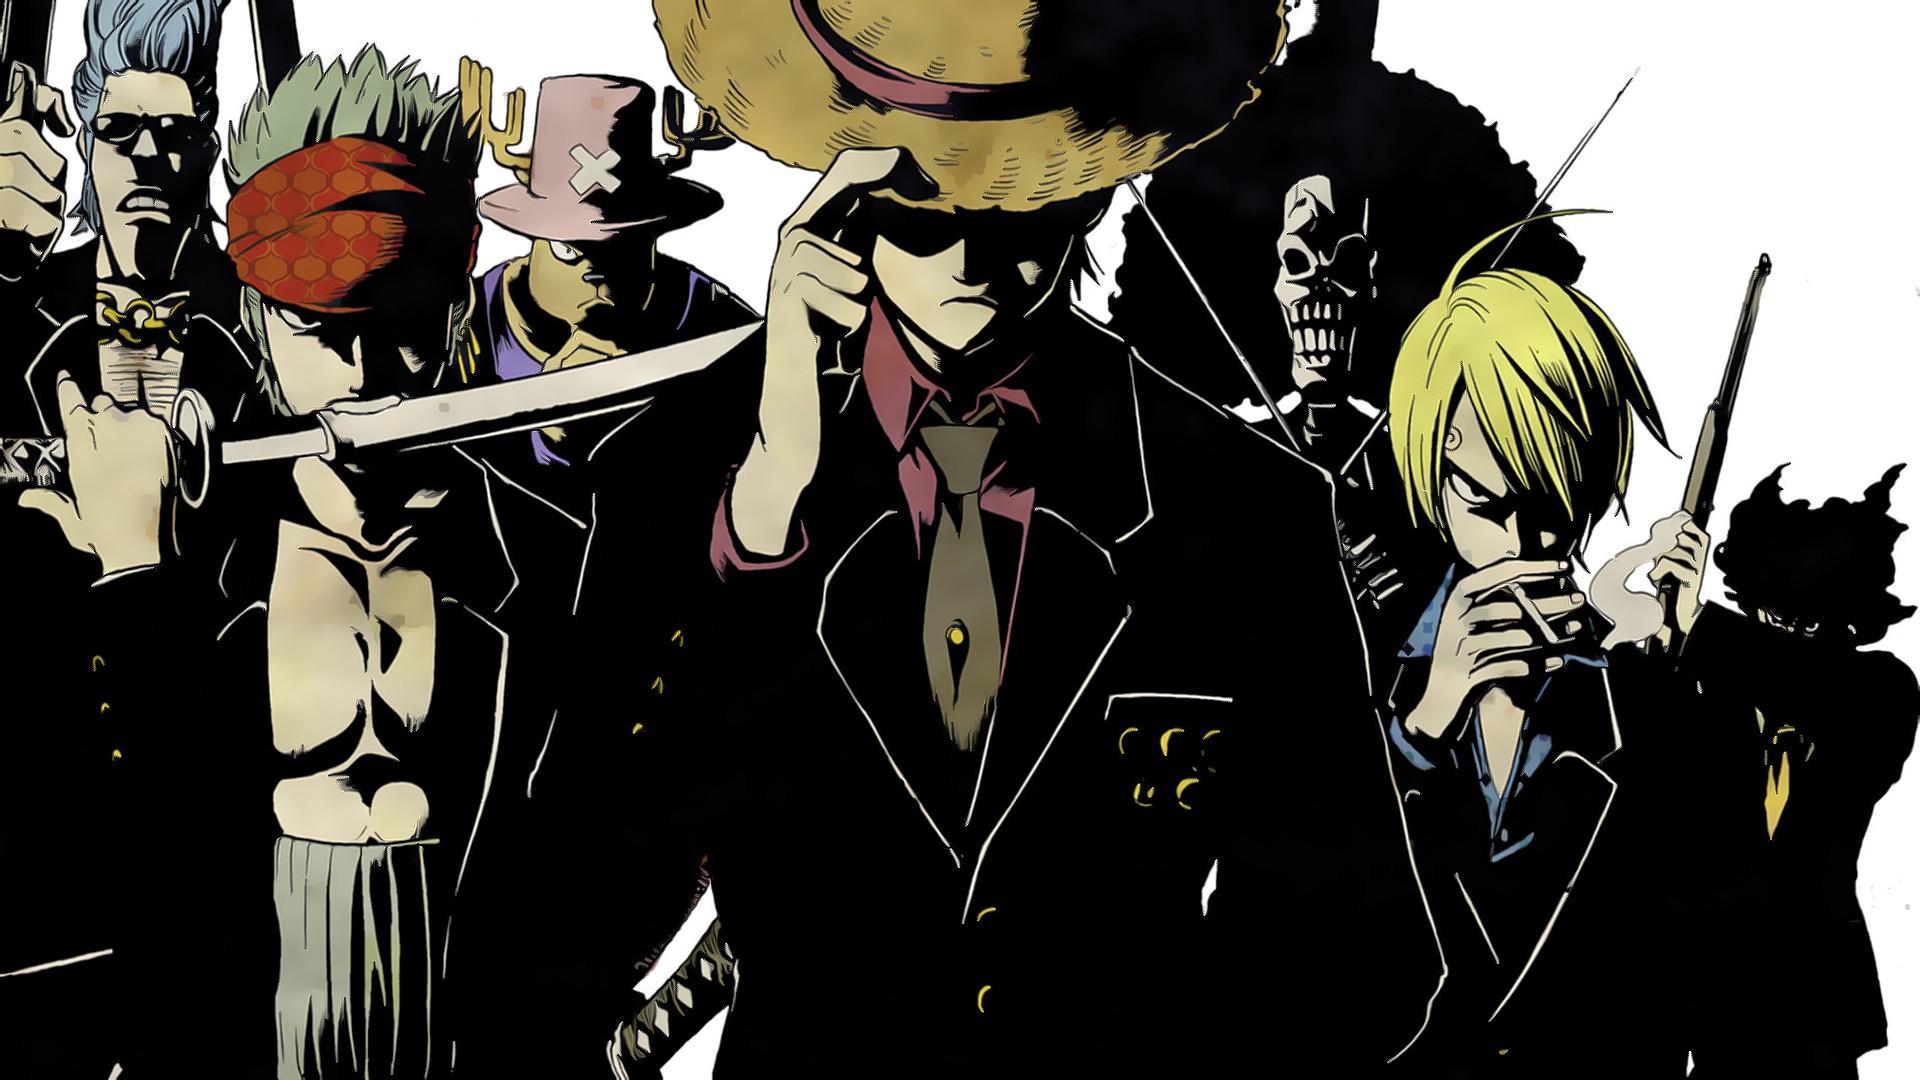 4K One Piece Wallpaper - WallpaperSafari